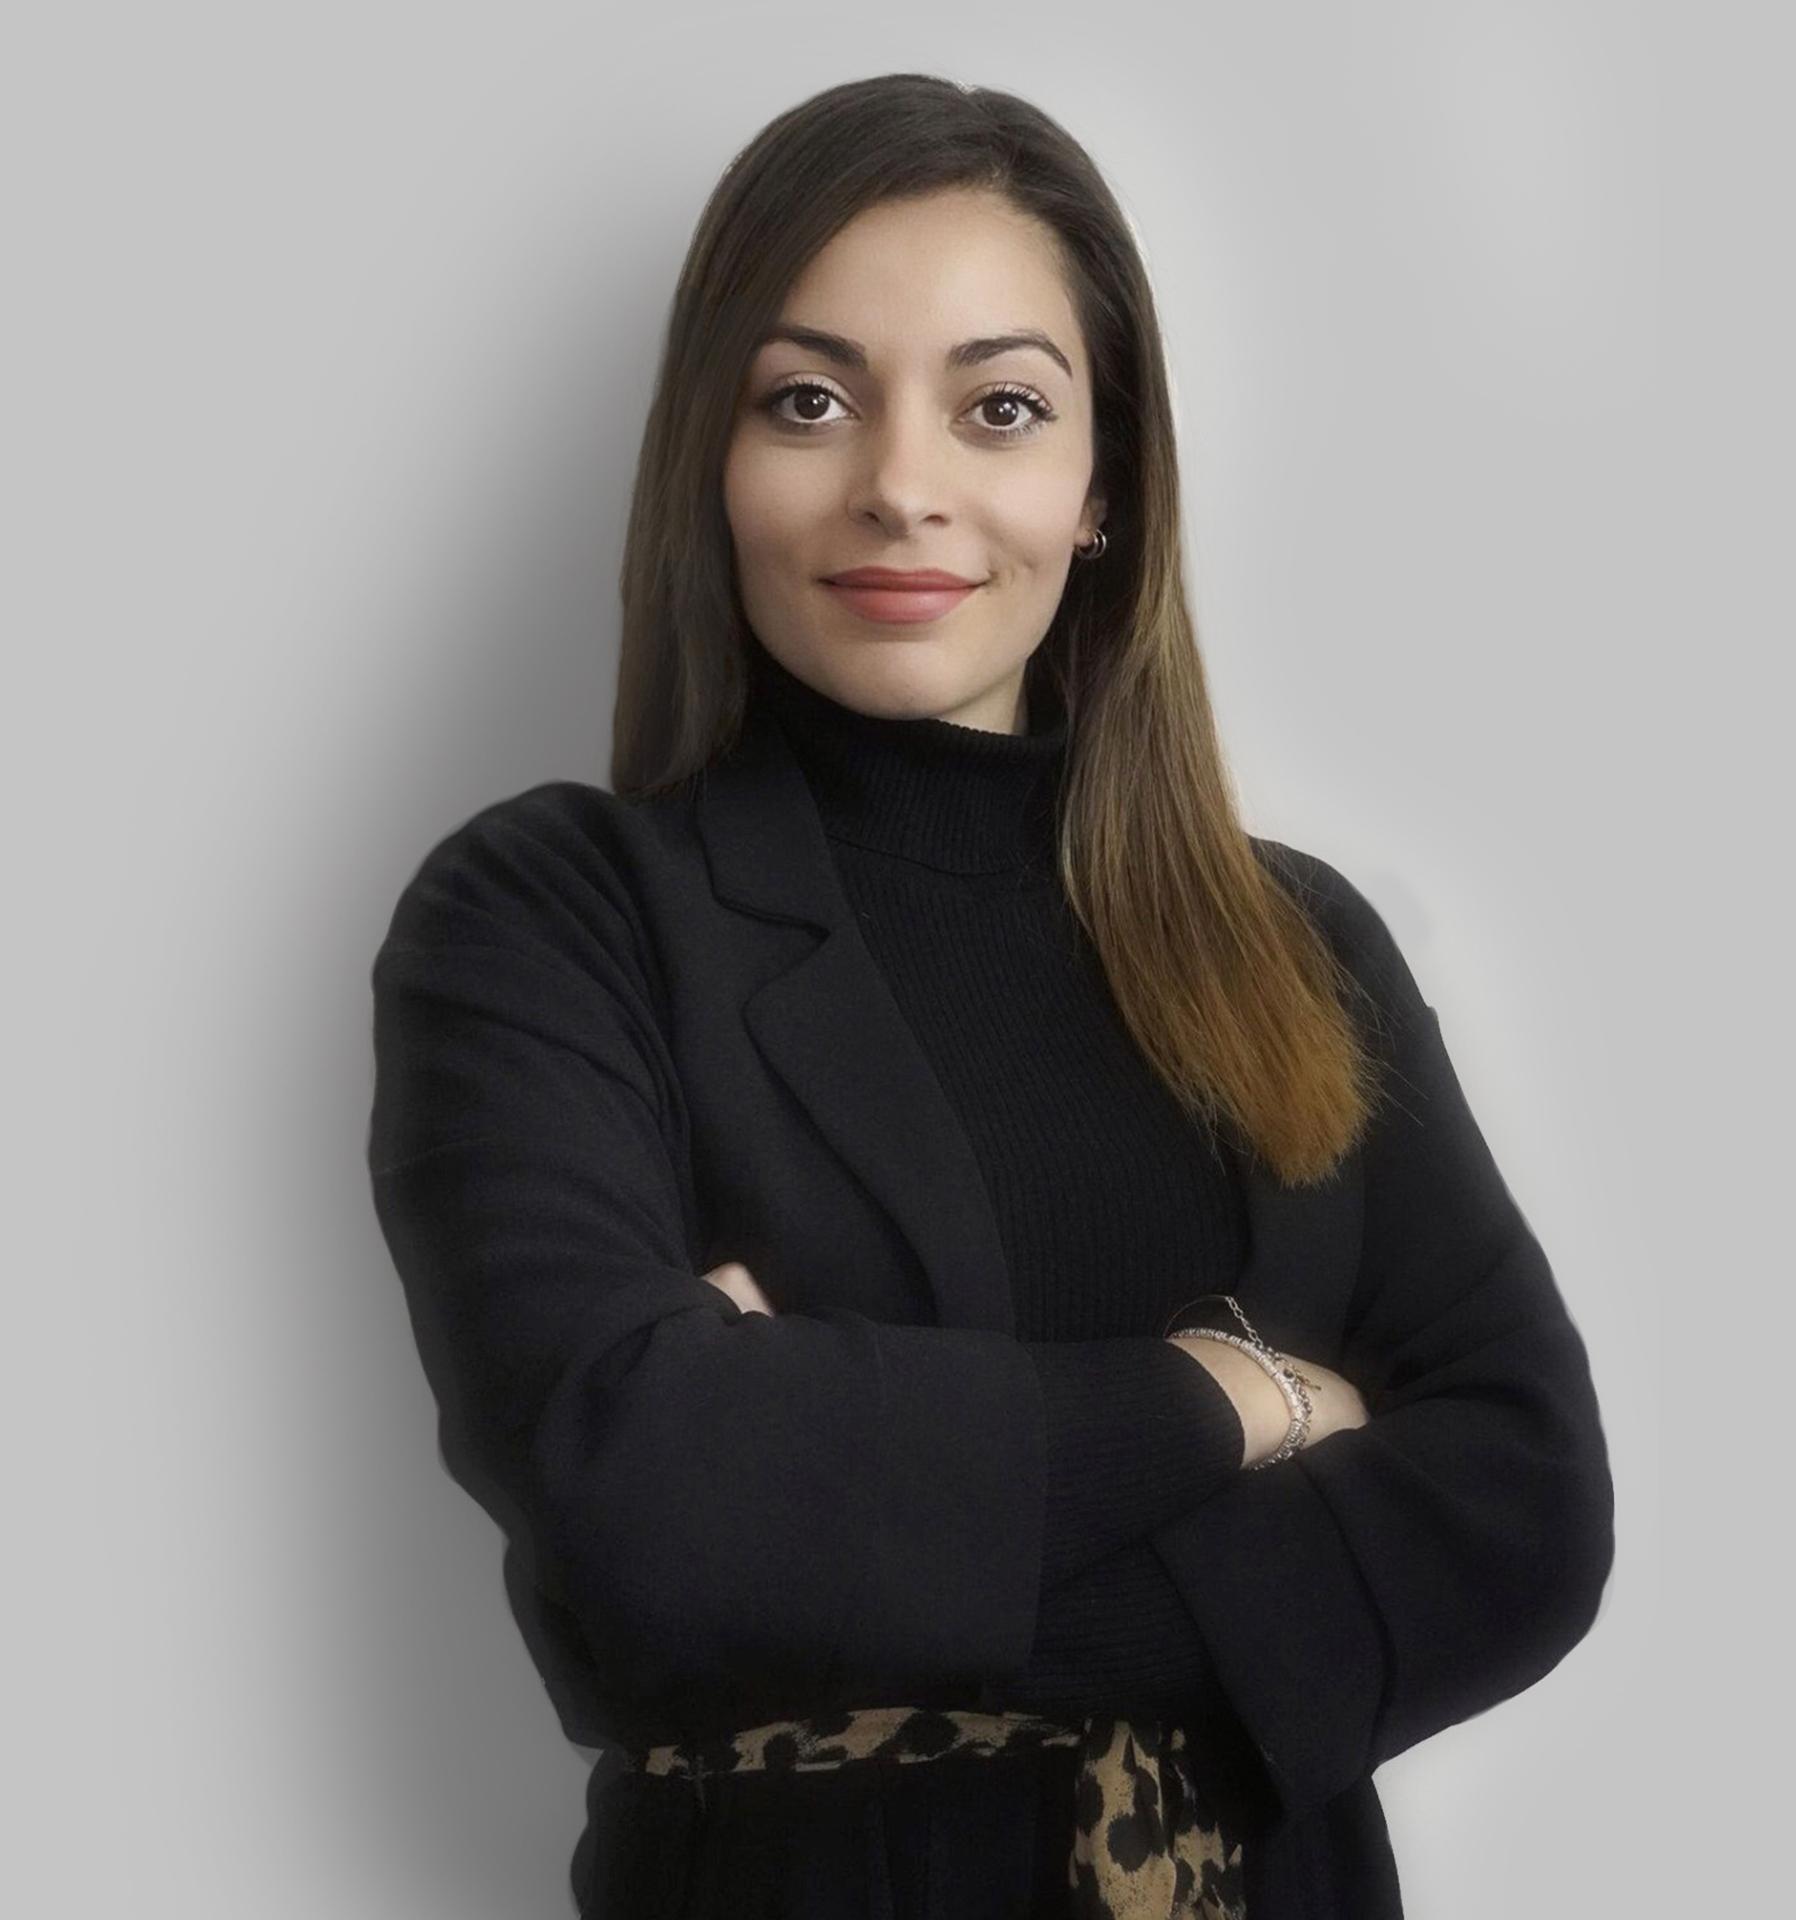 Dott.ssa Giulia Gioffredi